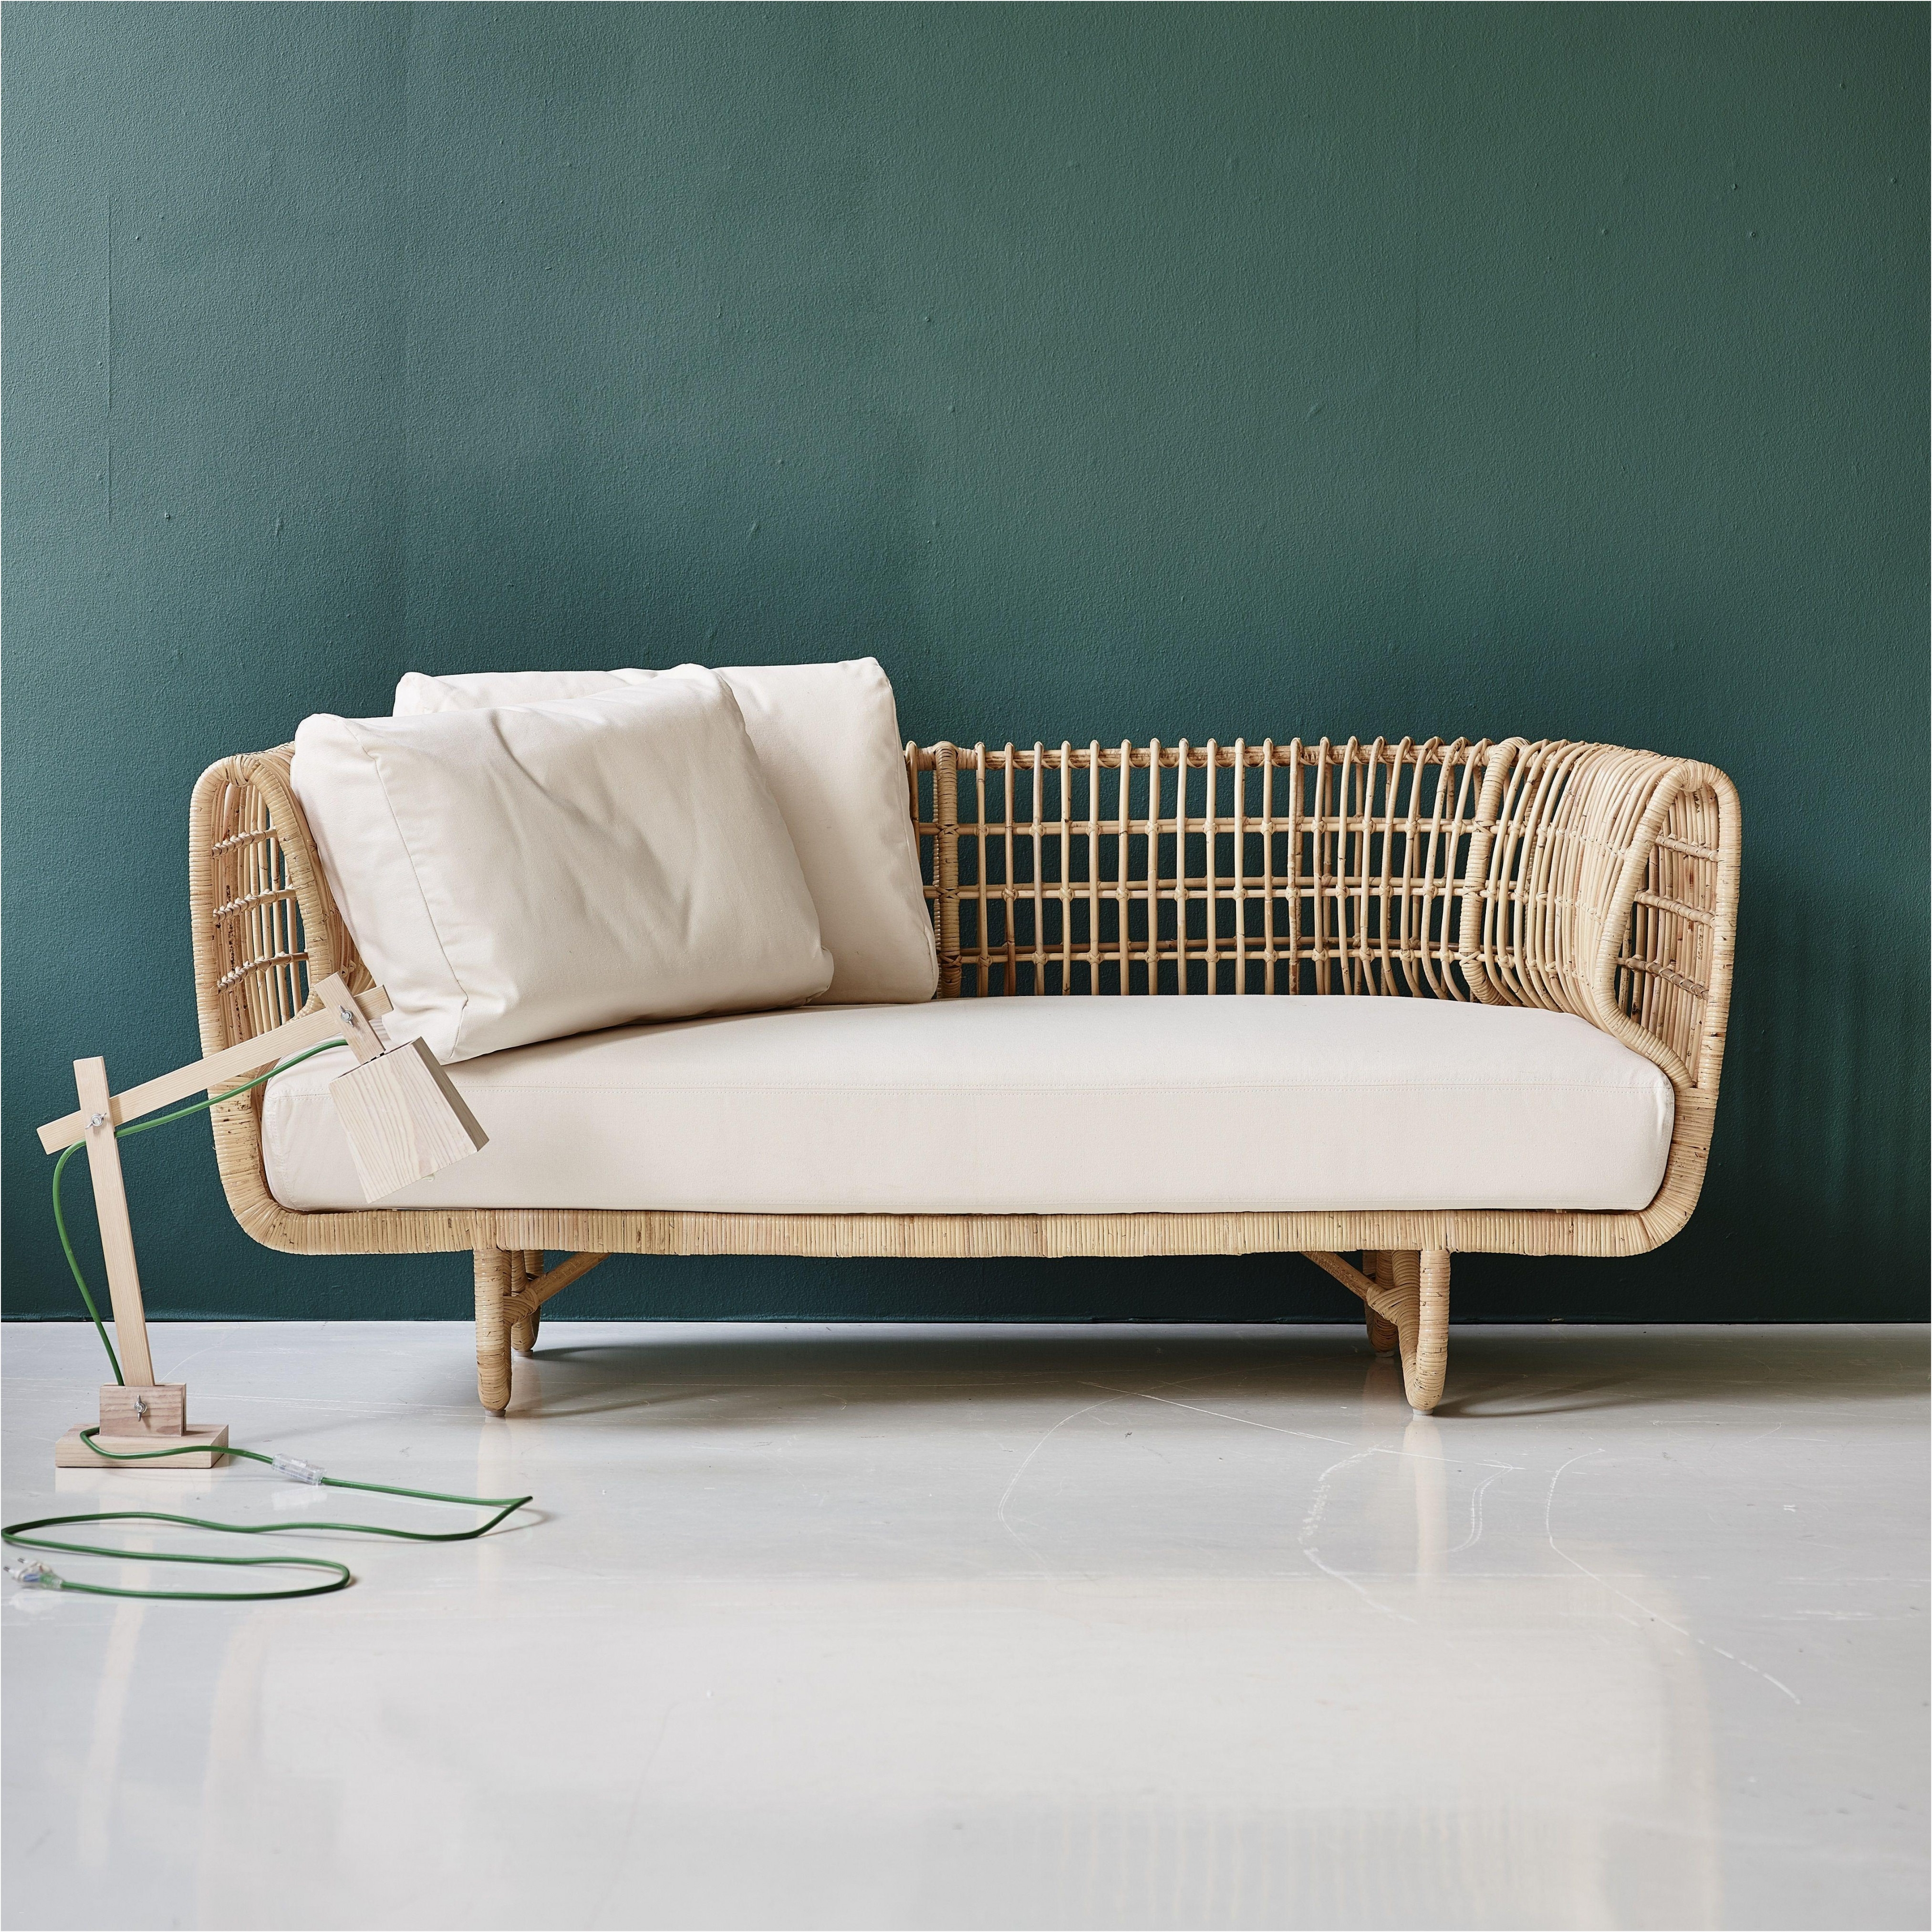 Free Furniture Pick Up Service Best Of Beautiful